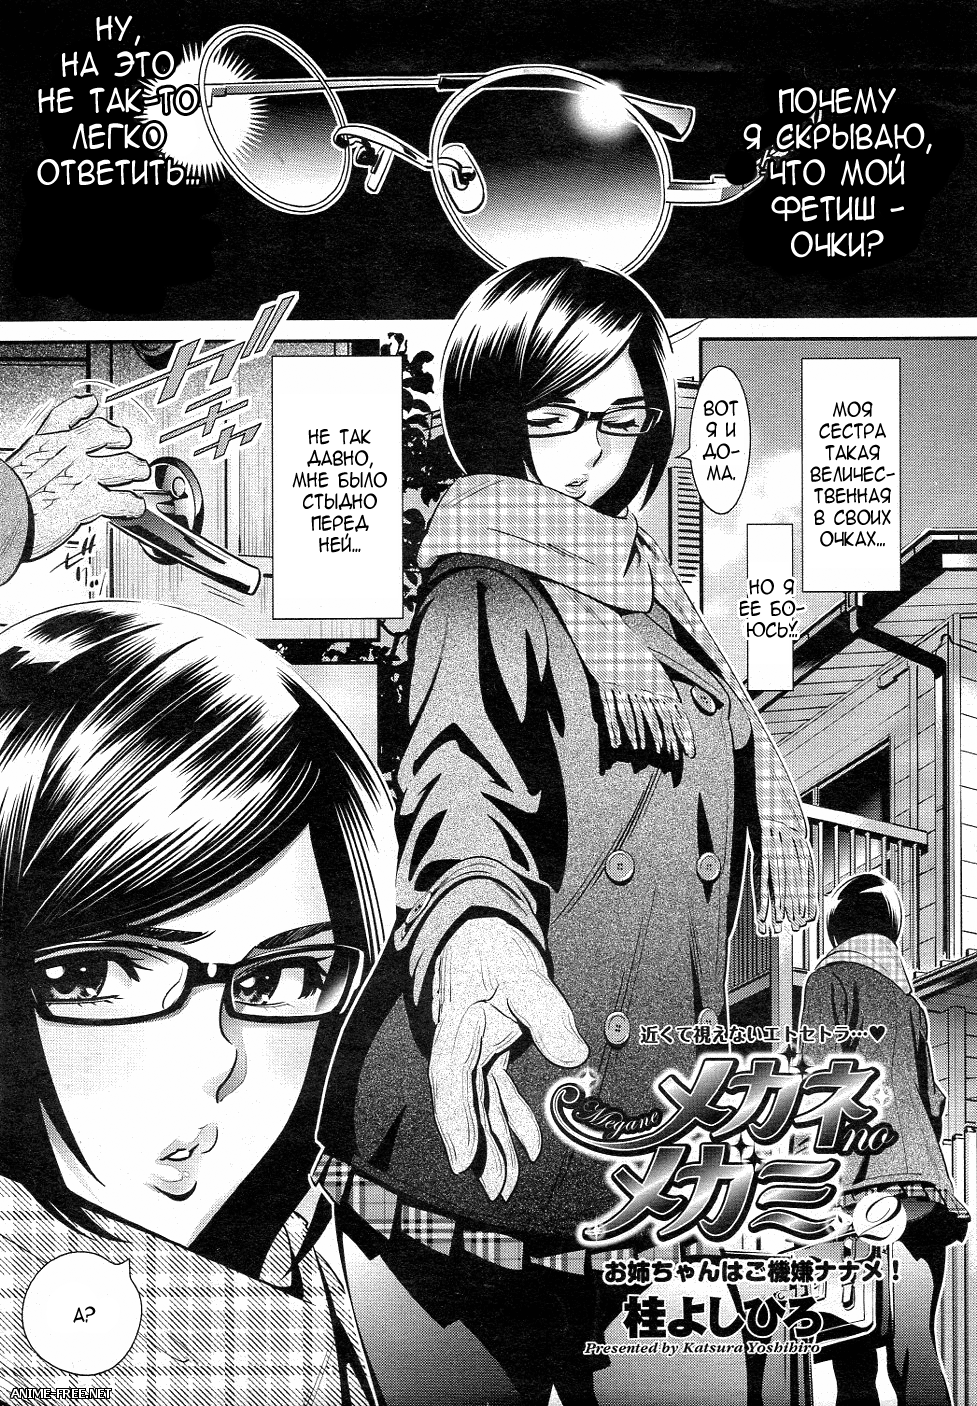 Katsura Yoshihiro — Goddess with Glasses / Megane no Megami / Богиня в очках [Cen] [RUS] Manga Hentai